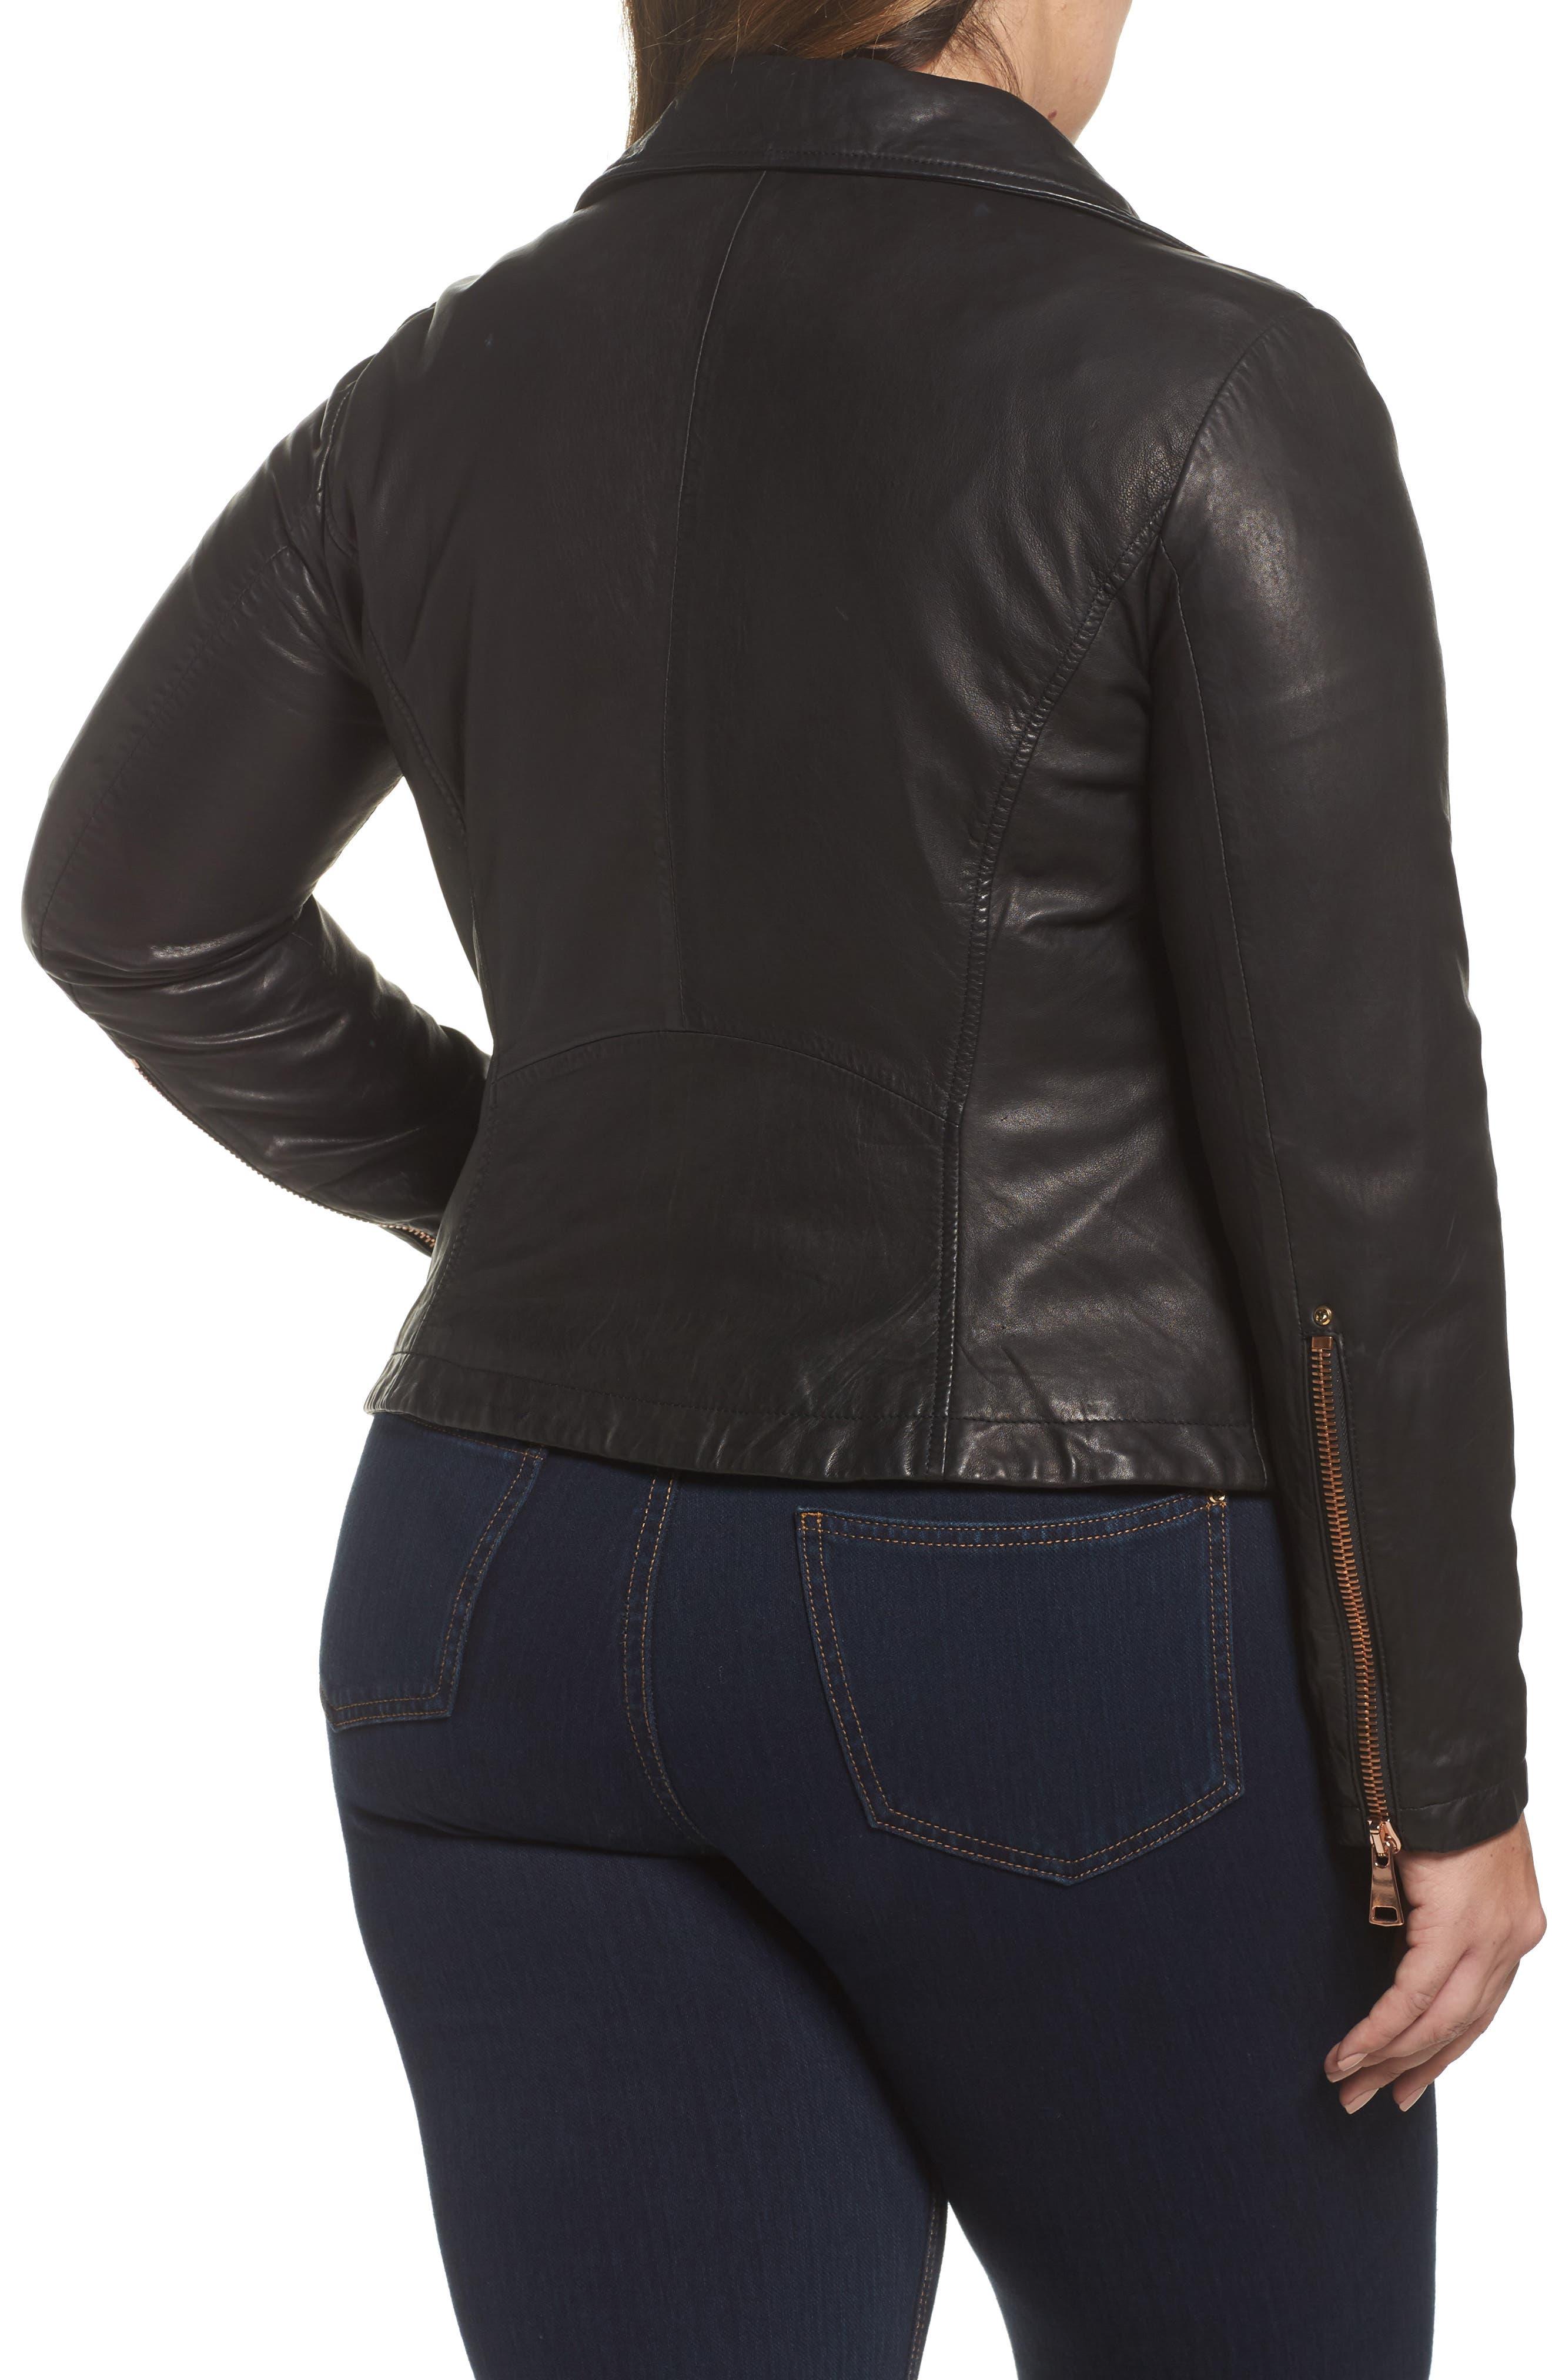 Ebanista Leather Biker Jacket,                             Alternate thumbnail 2, color,                             001